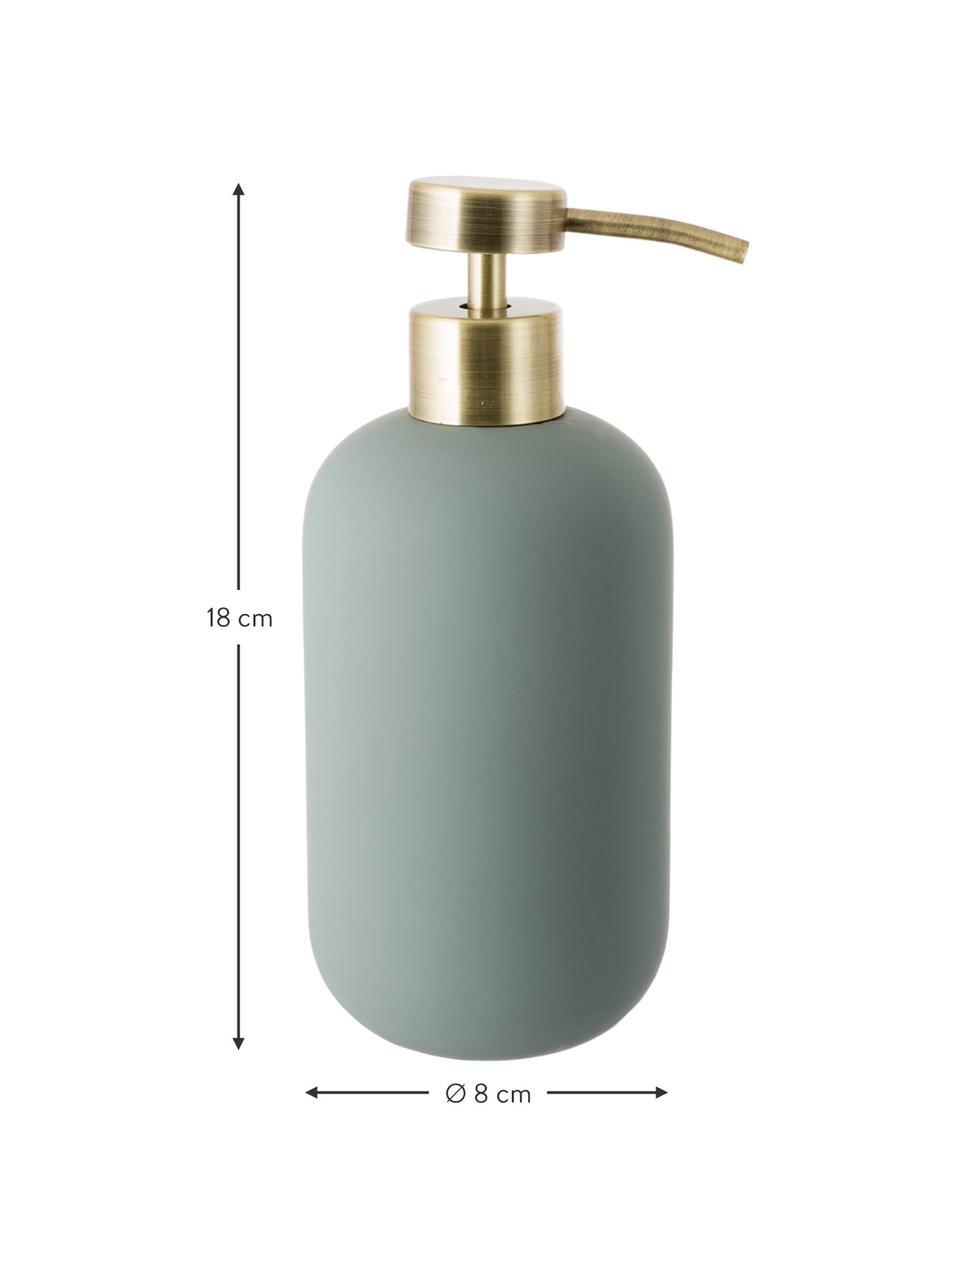 Keramik-Seifenspender Lotus, Behälter: Keramik, Pumpkopf: Metall, Grün, Messingfarben, Ø 8 x H 18 cm